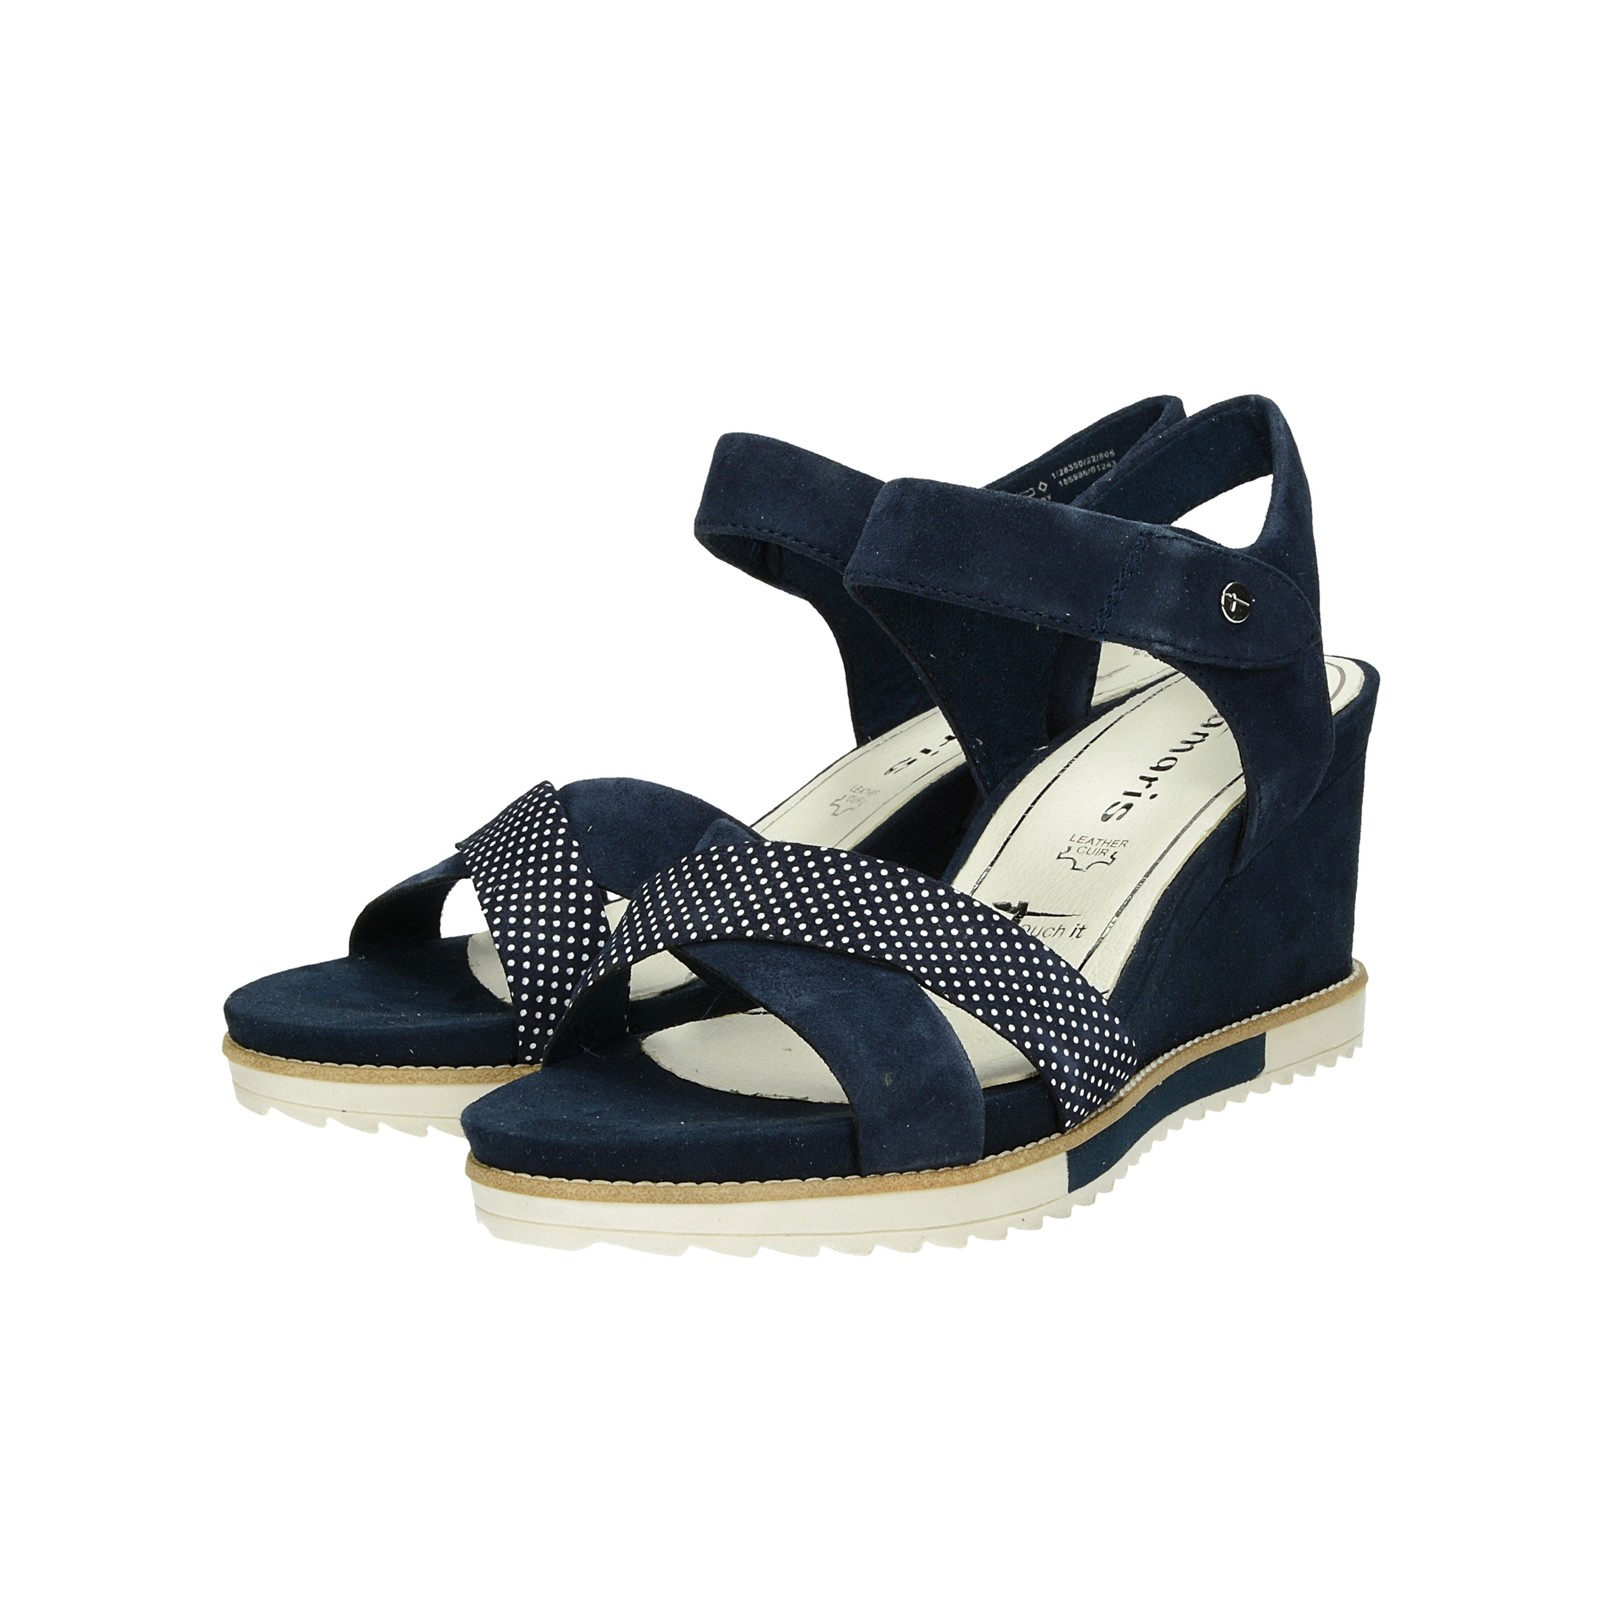 cb4a7f9eb3d5 Tamaris dámske semišové pohodlné sandále - tmavomodré ...